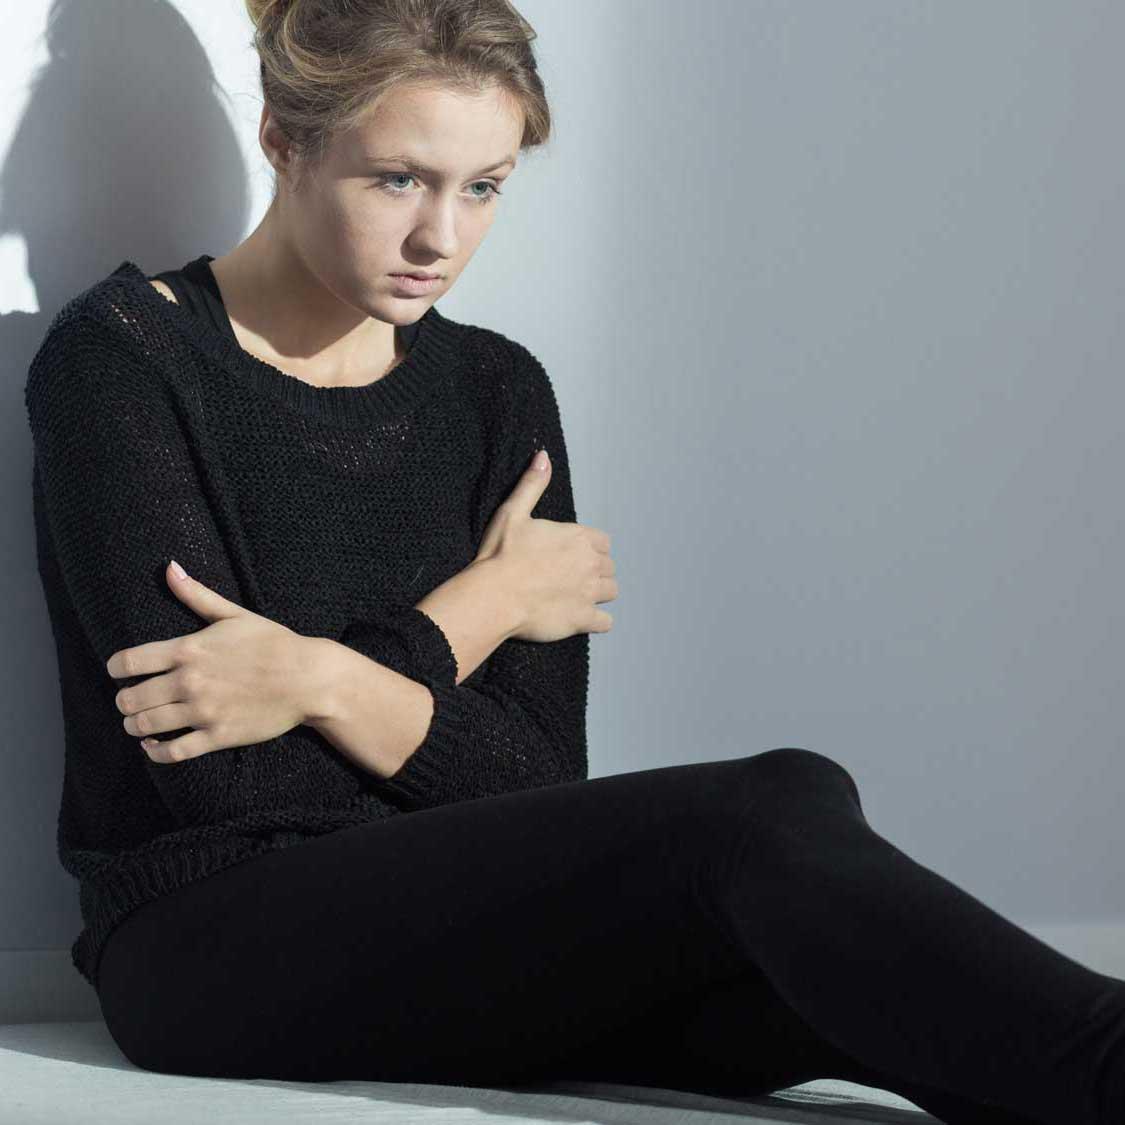 Bulimia Nervosa Treatment